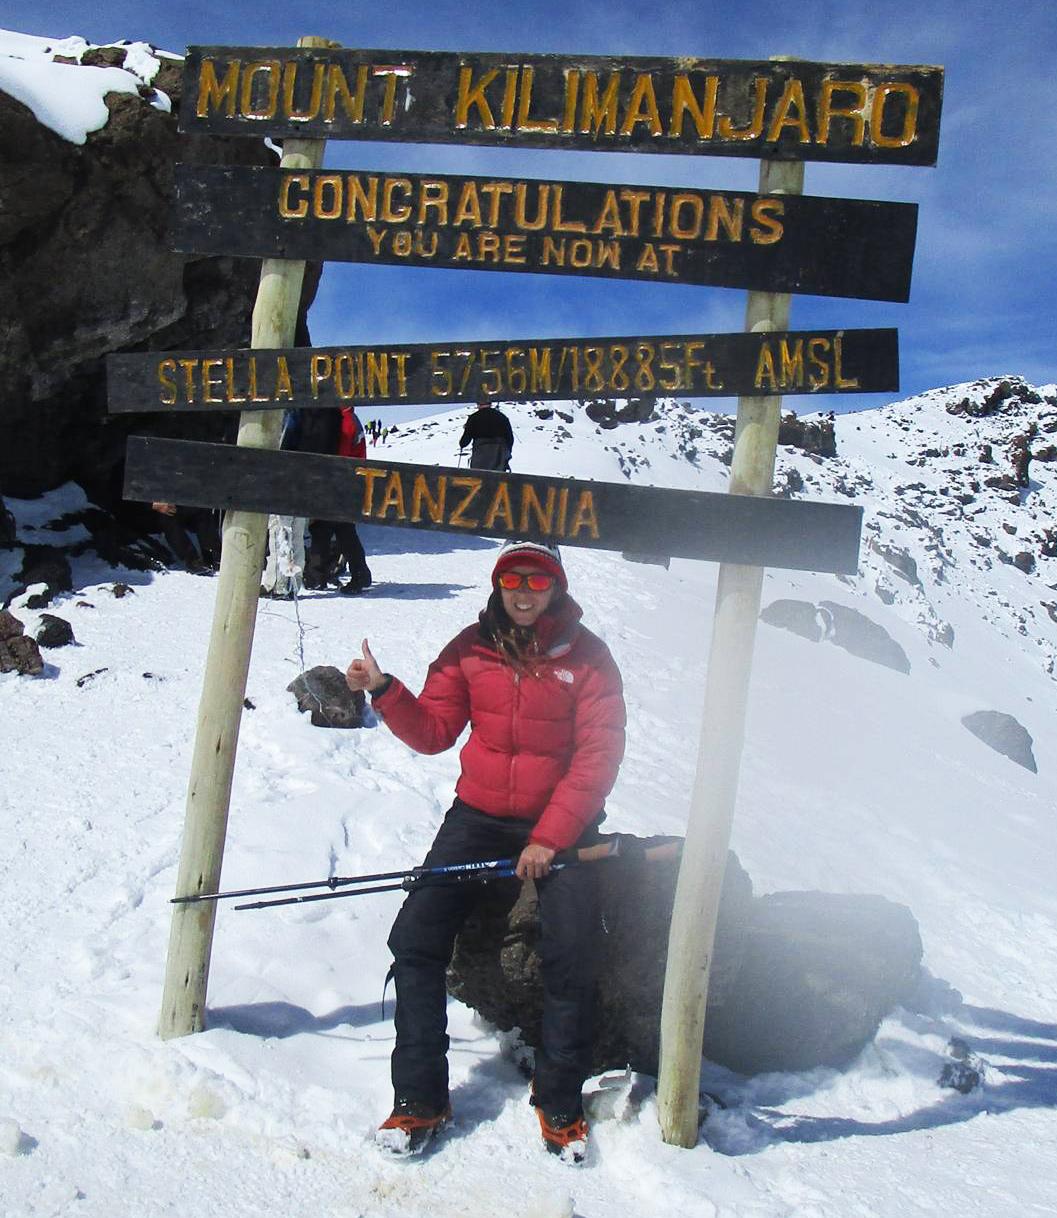 Stella Point, Kilimanjaro